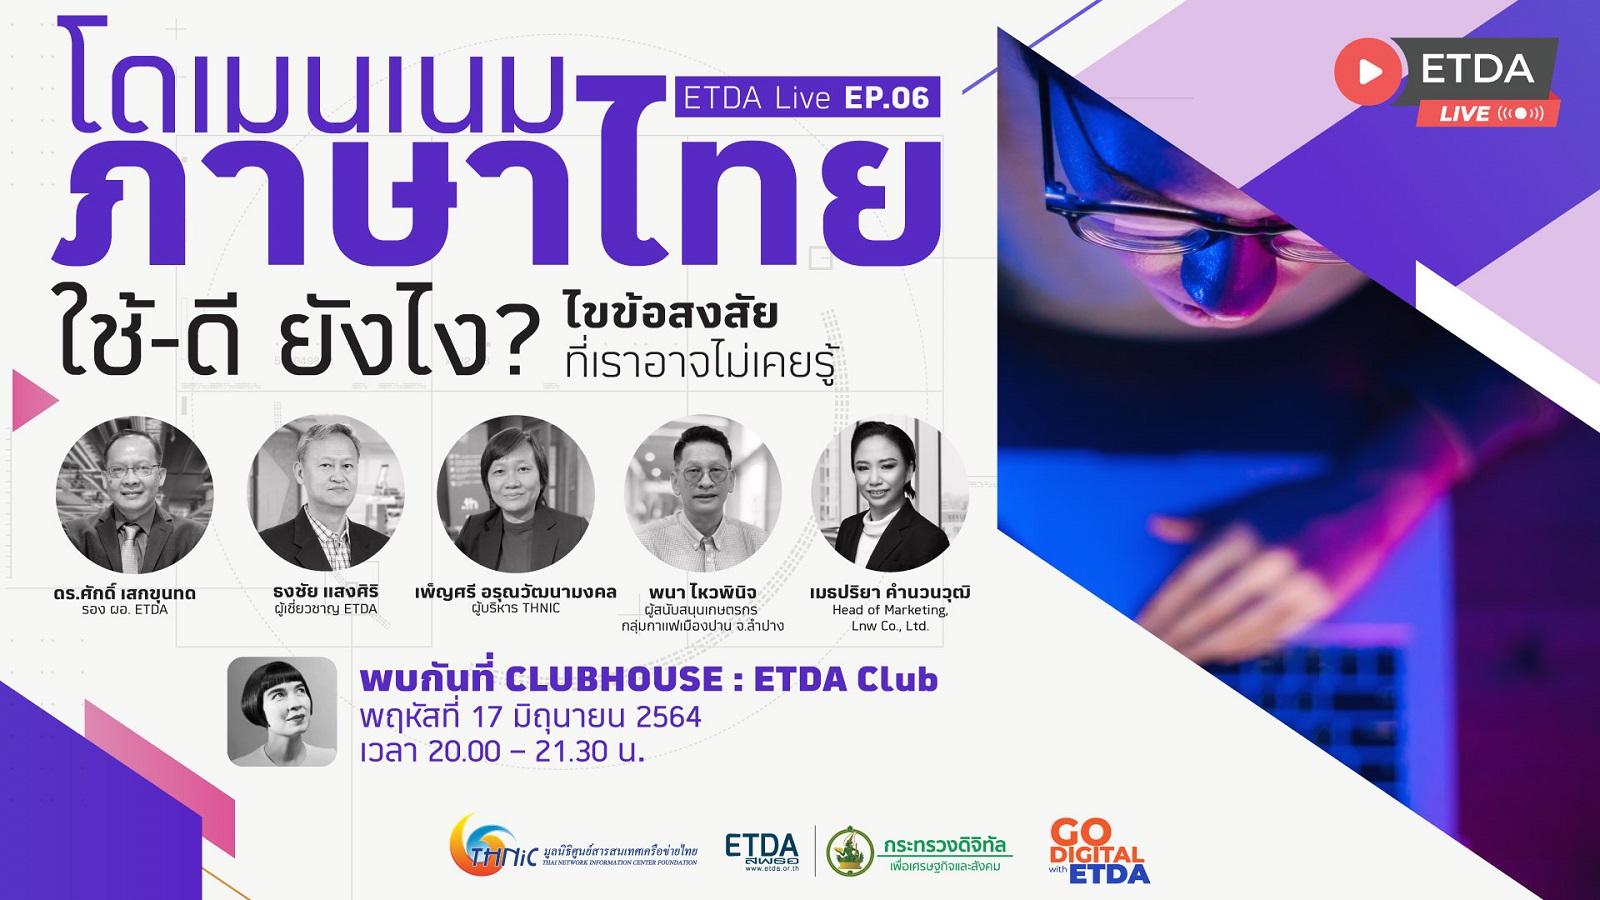 ETDA Live Ep.6: โดเมนเนมภาษาไทย ใช้-ดี ยังไง? ไขข้อสงสัย ที่เราอาจไม่เคยรู้